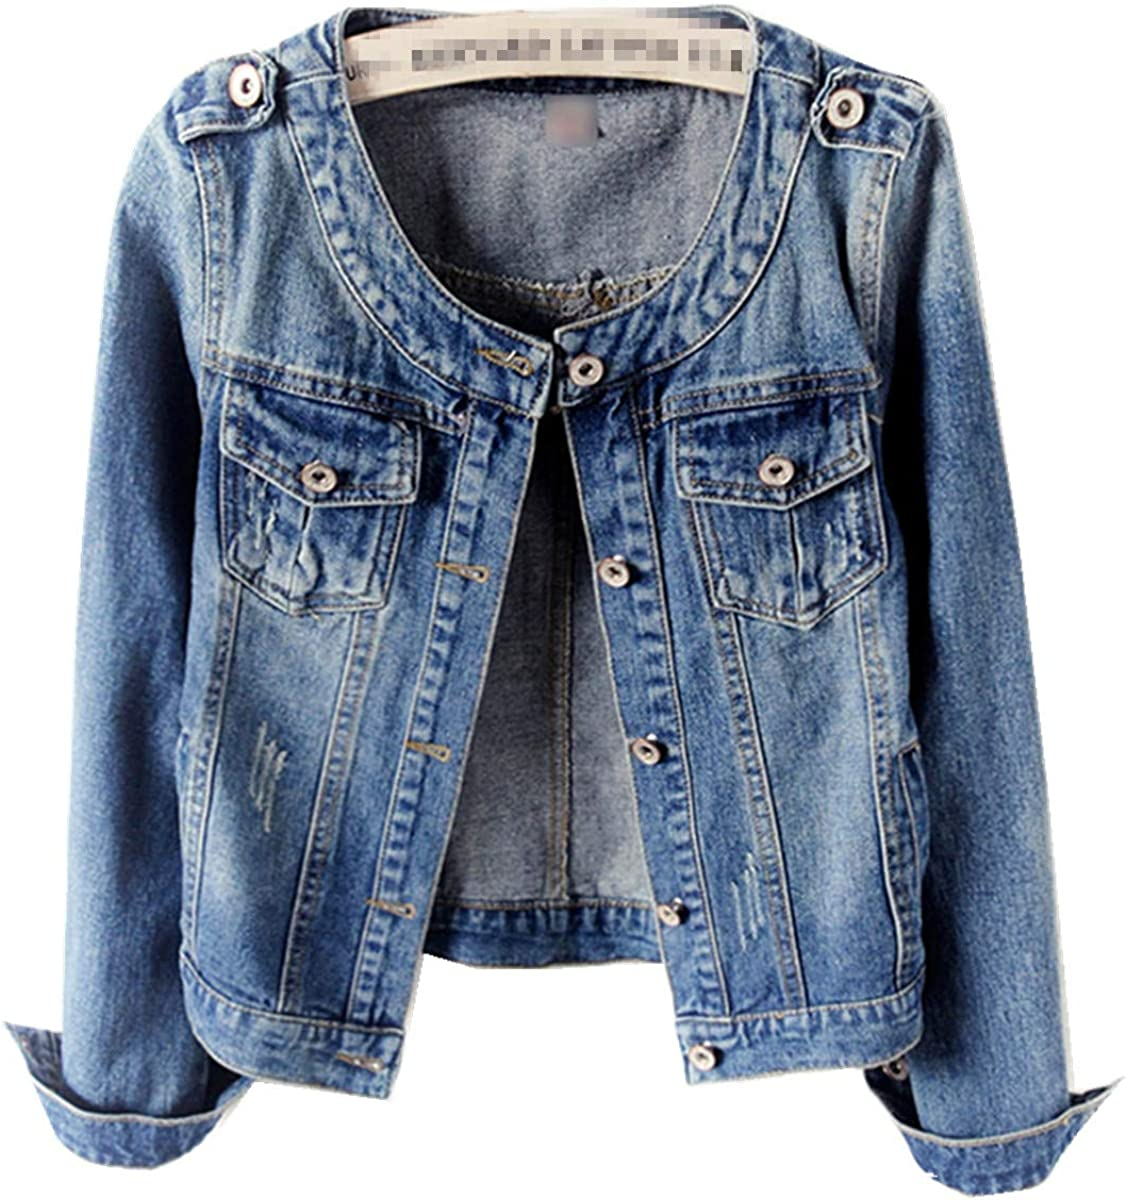 S-6XL Women's Collarless Denim Jackets Long Sleeve Classic Short Jeans Coat